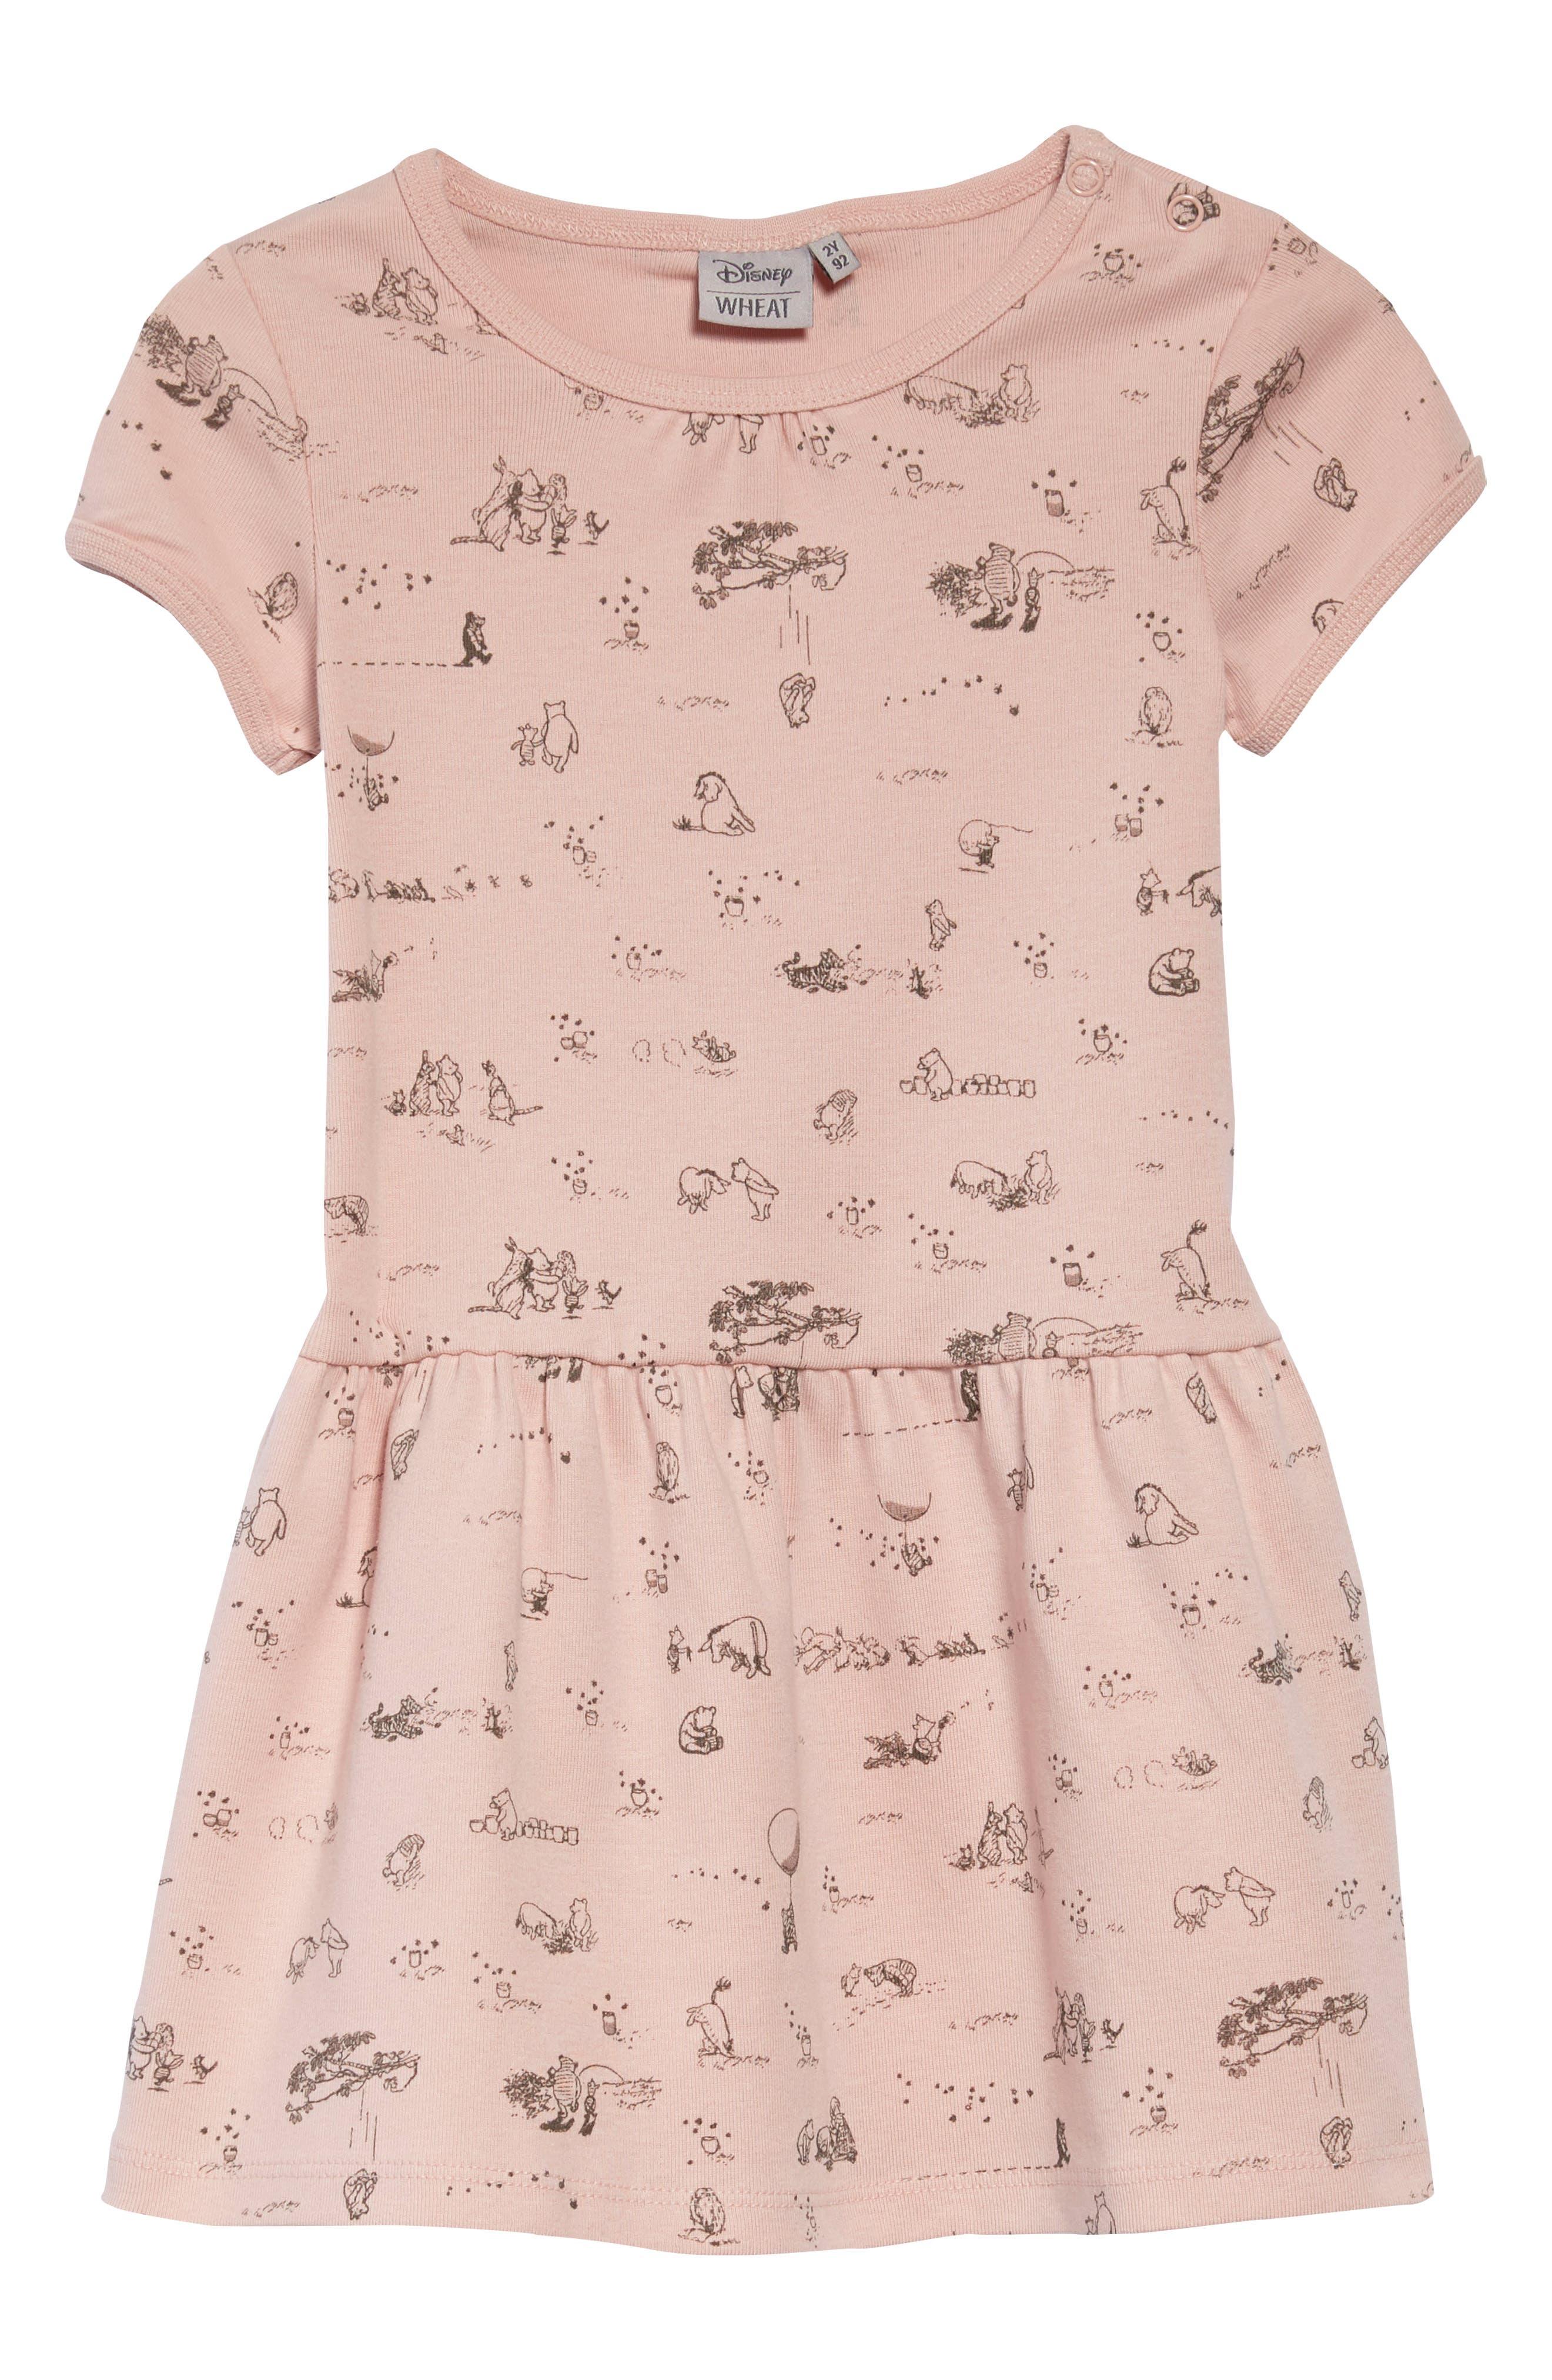 x Disney<sup>®</sup> Winnie the Pooh Print Dress,                         Main,                         color, 651